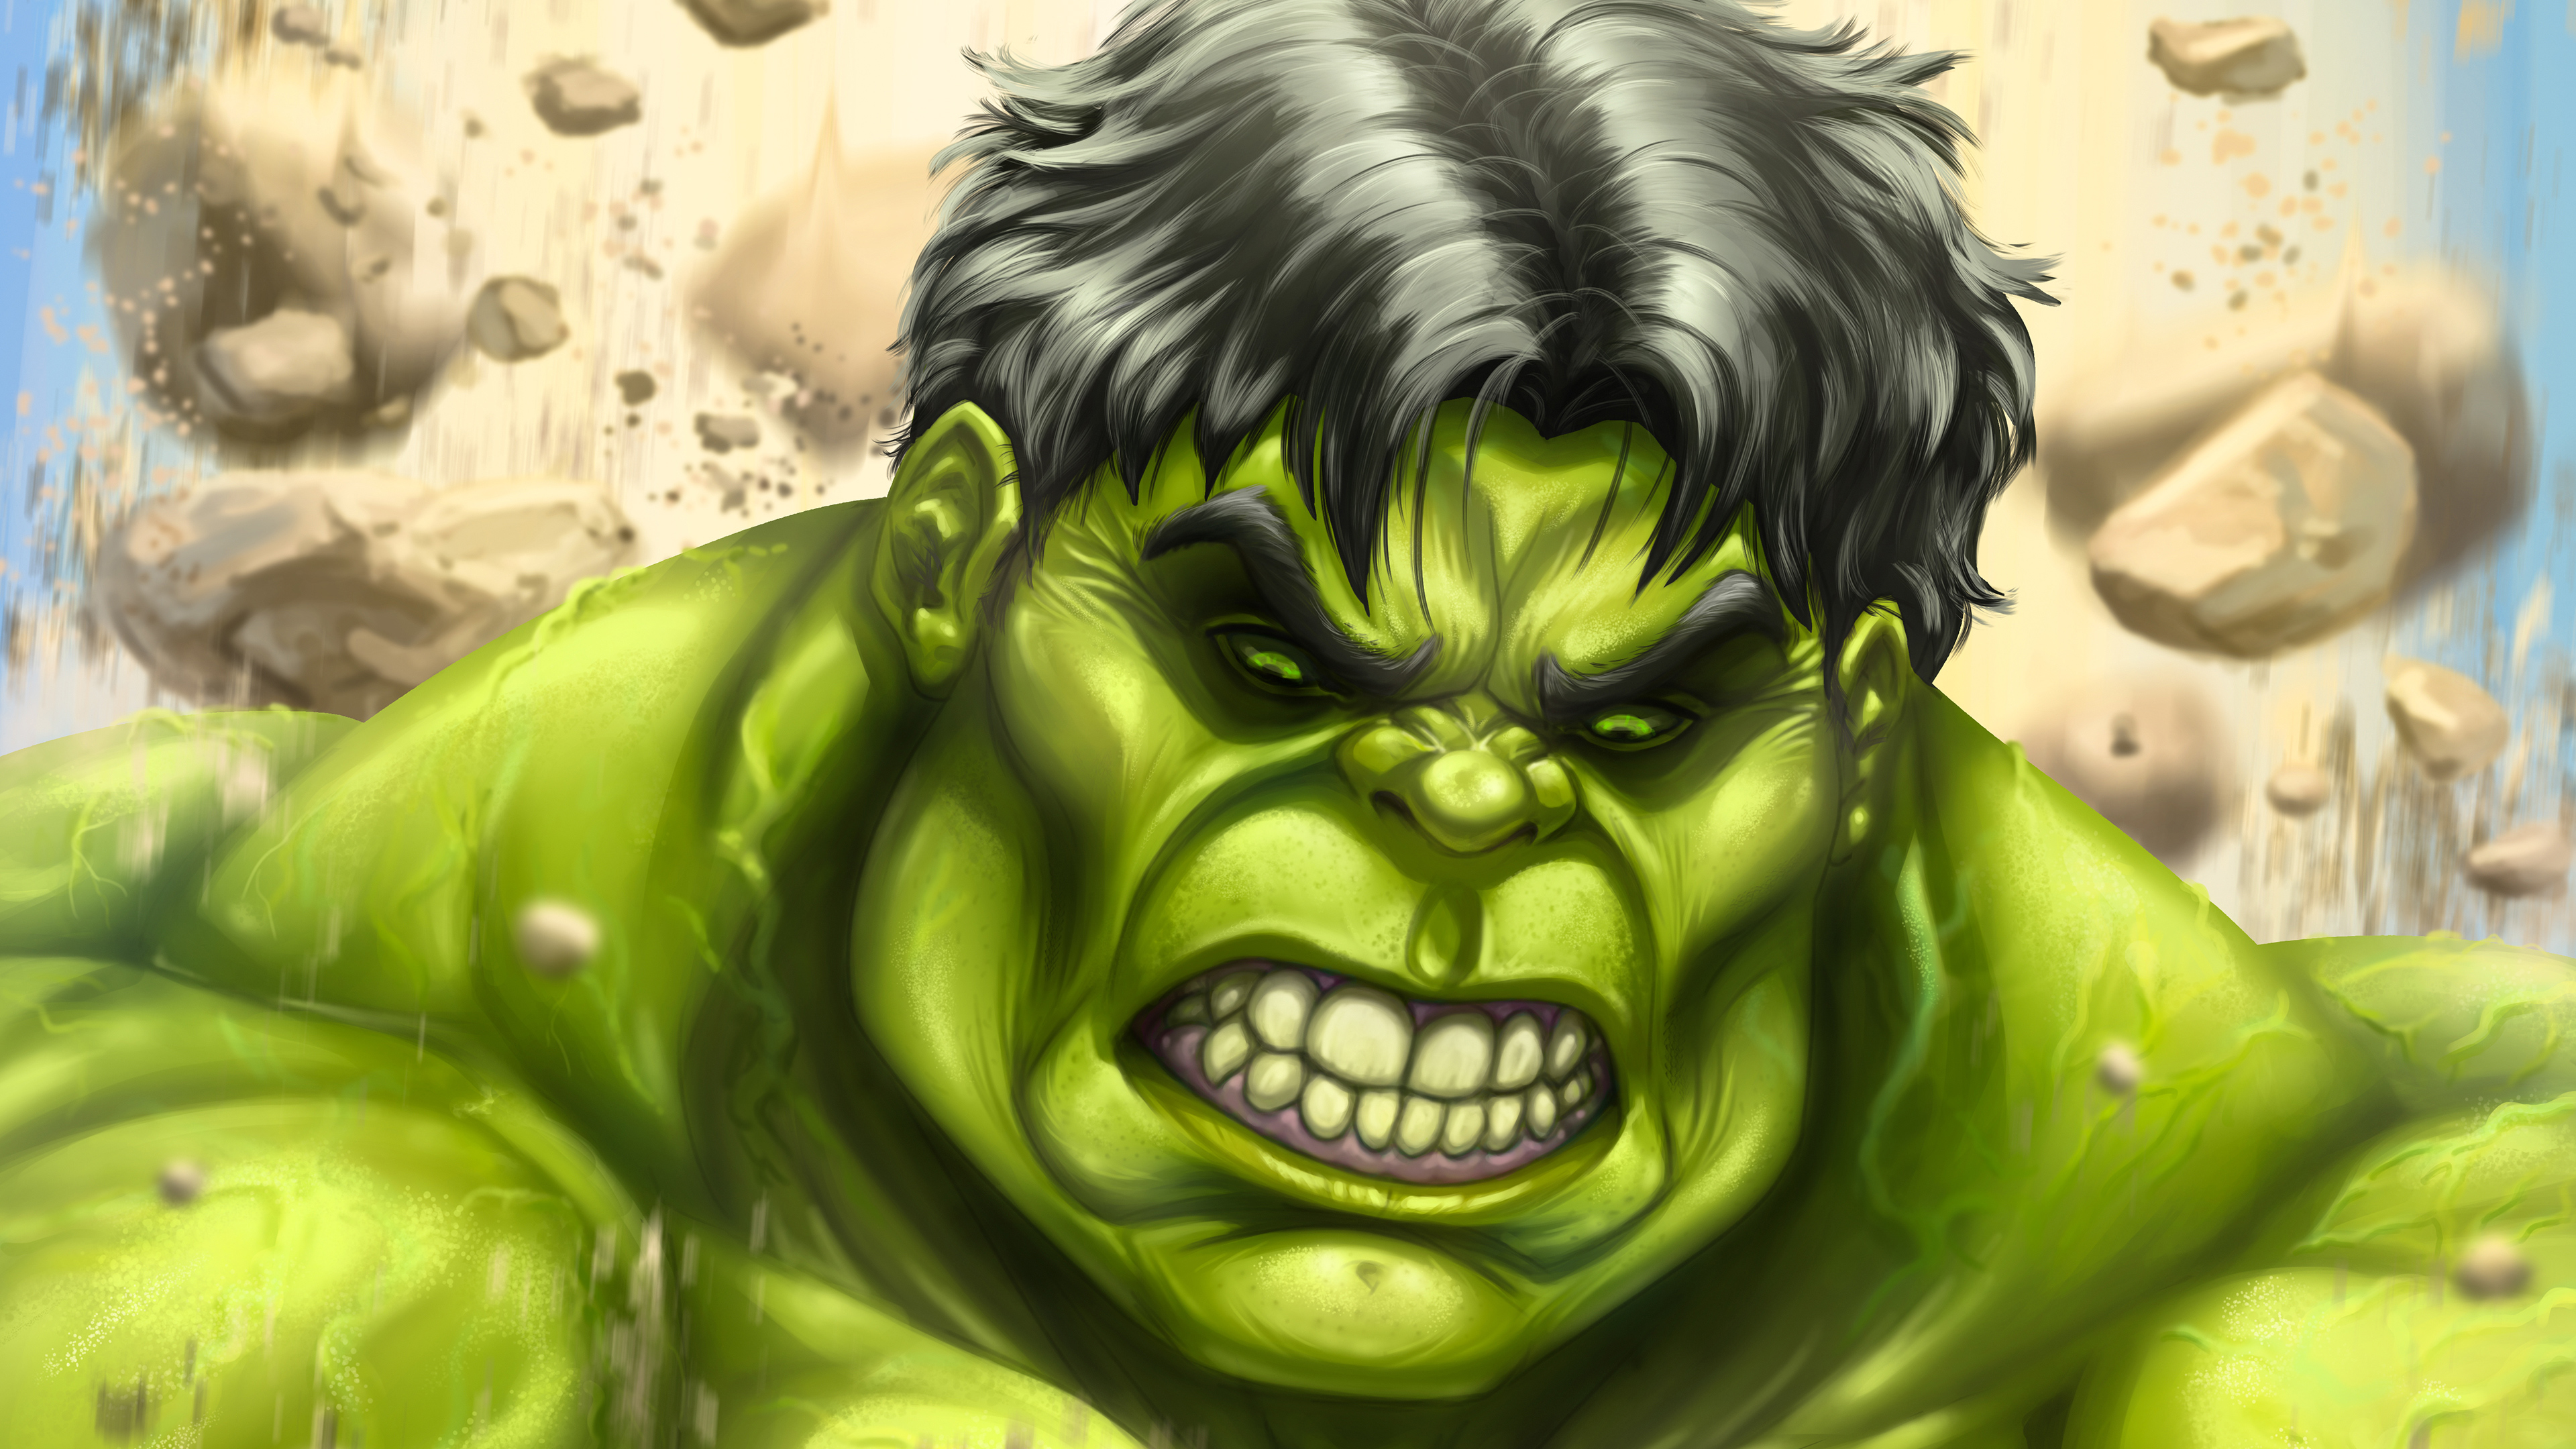 the incredibles hulk art 4k 1554244974 - The Incredibles Hulk Art 4k - superheroes wallpapers, hulk wallpapers, hd-wallpapers, digital art wallpapers, behance wallpapers, artwork wallpapers, 4k-wallpapers